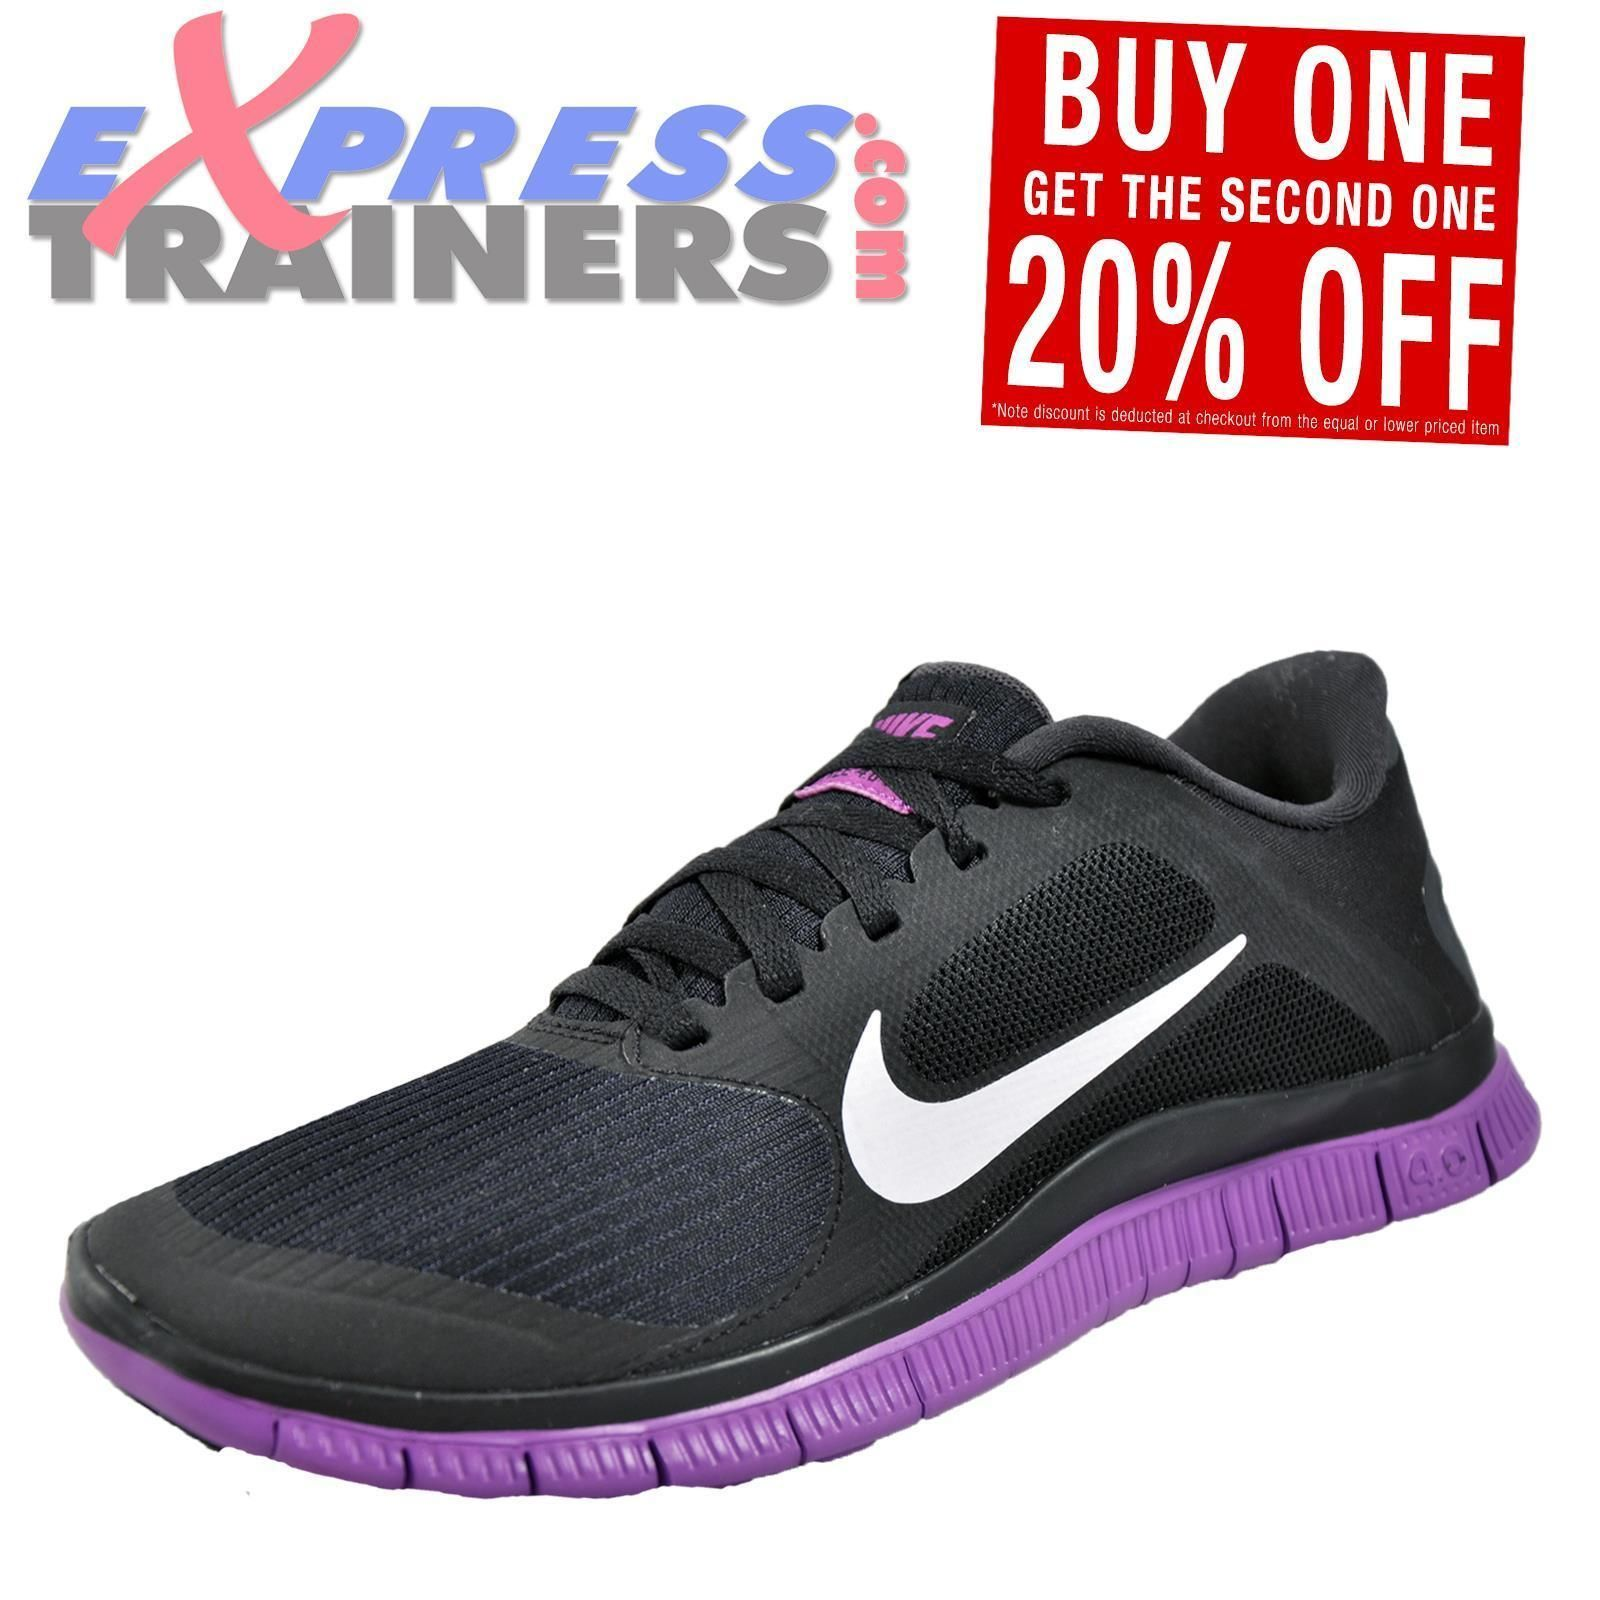 dacd7f7836b Nike Free 4.0 V3 Womens Running Shoes Fitness Gym Trainers Black Uk ...